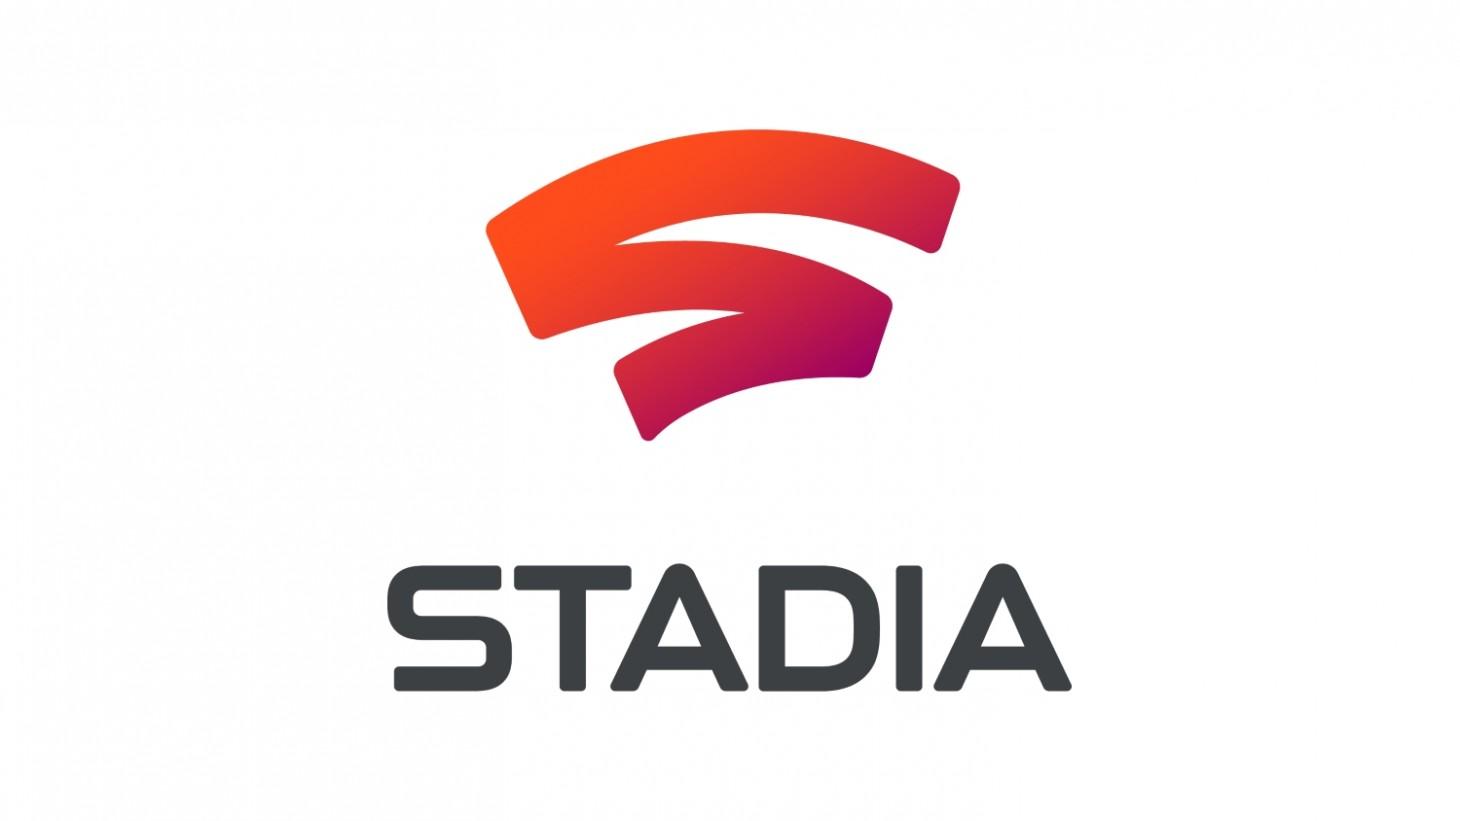 Google Stadia Launches November 19.